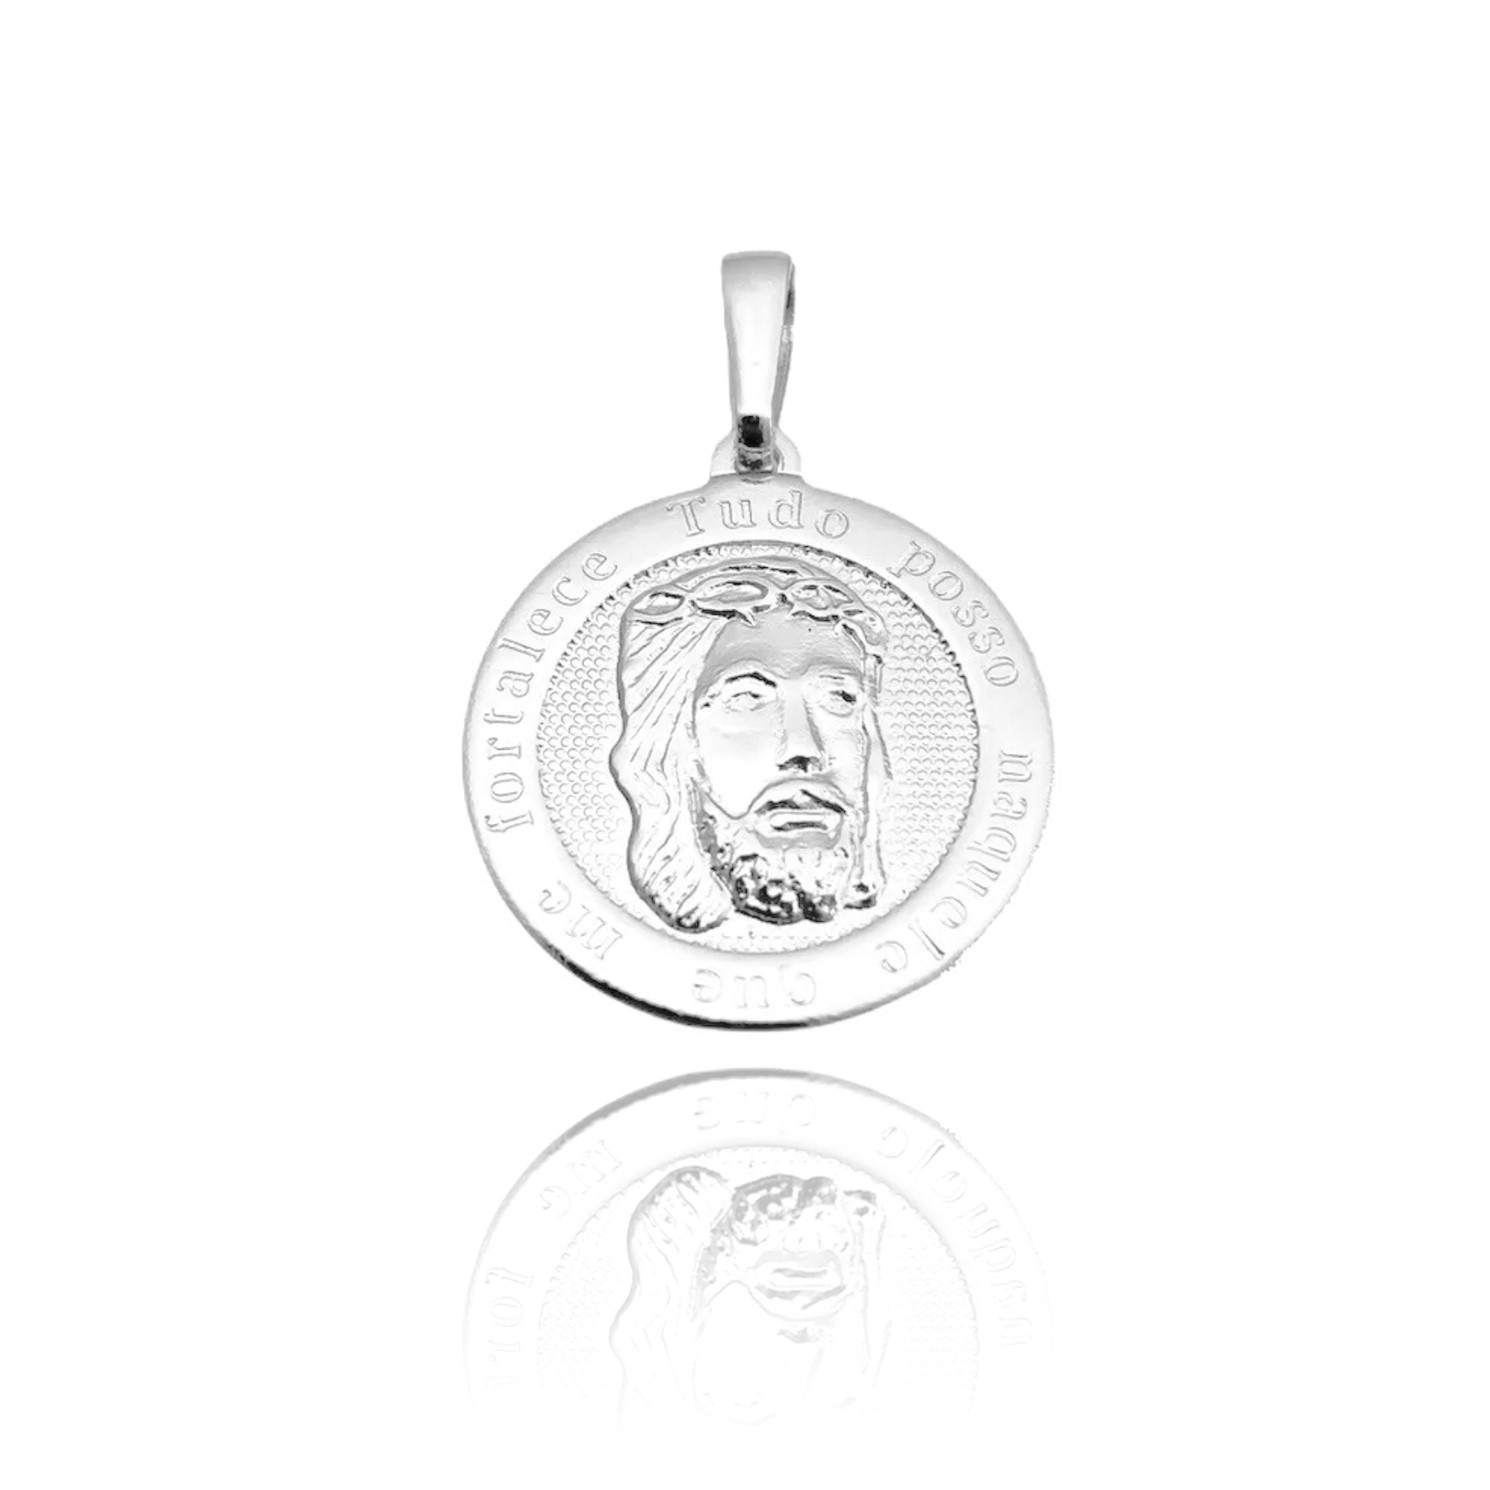 Pingente Face de Cristo Redondo (2cmX2cm) (Banho Prata 925)